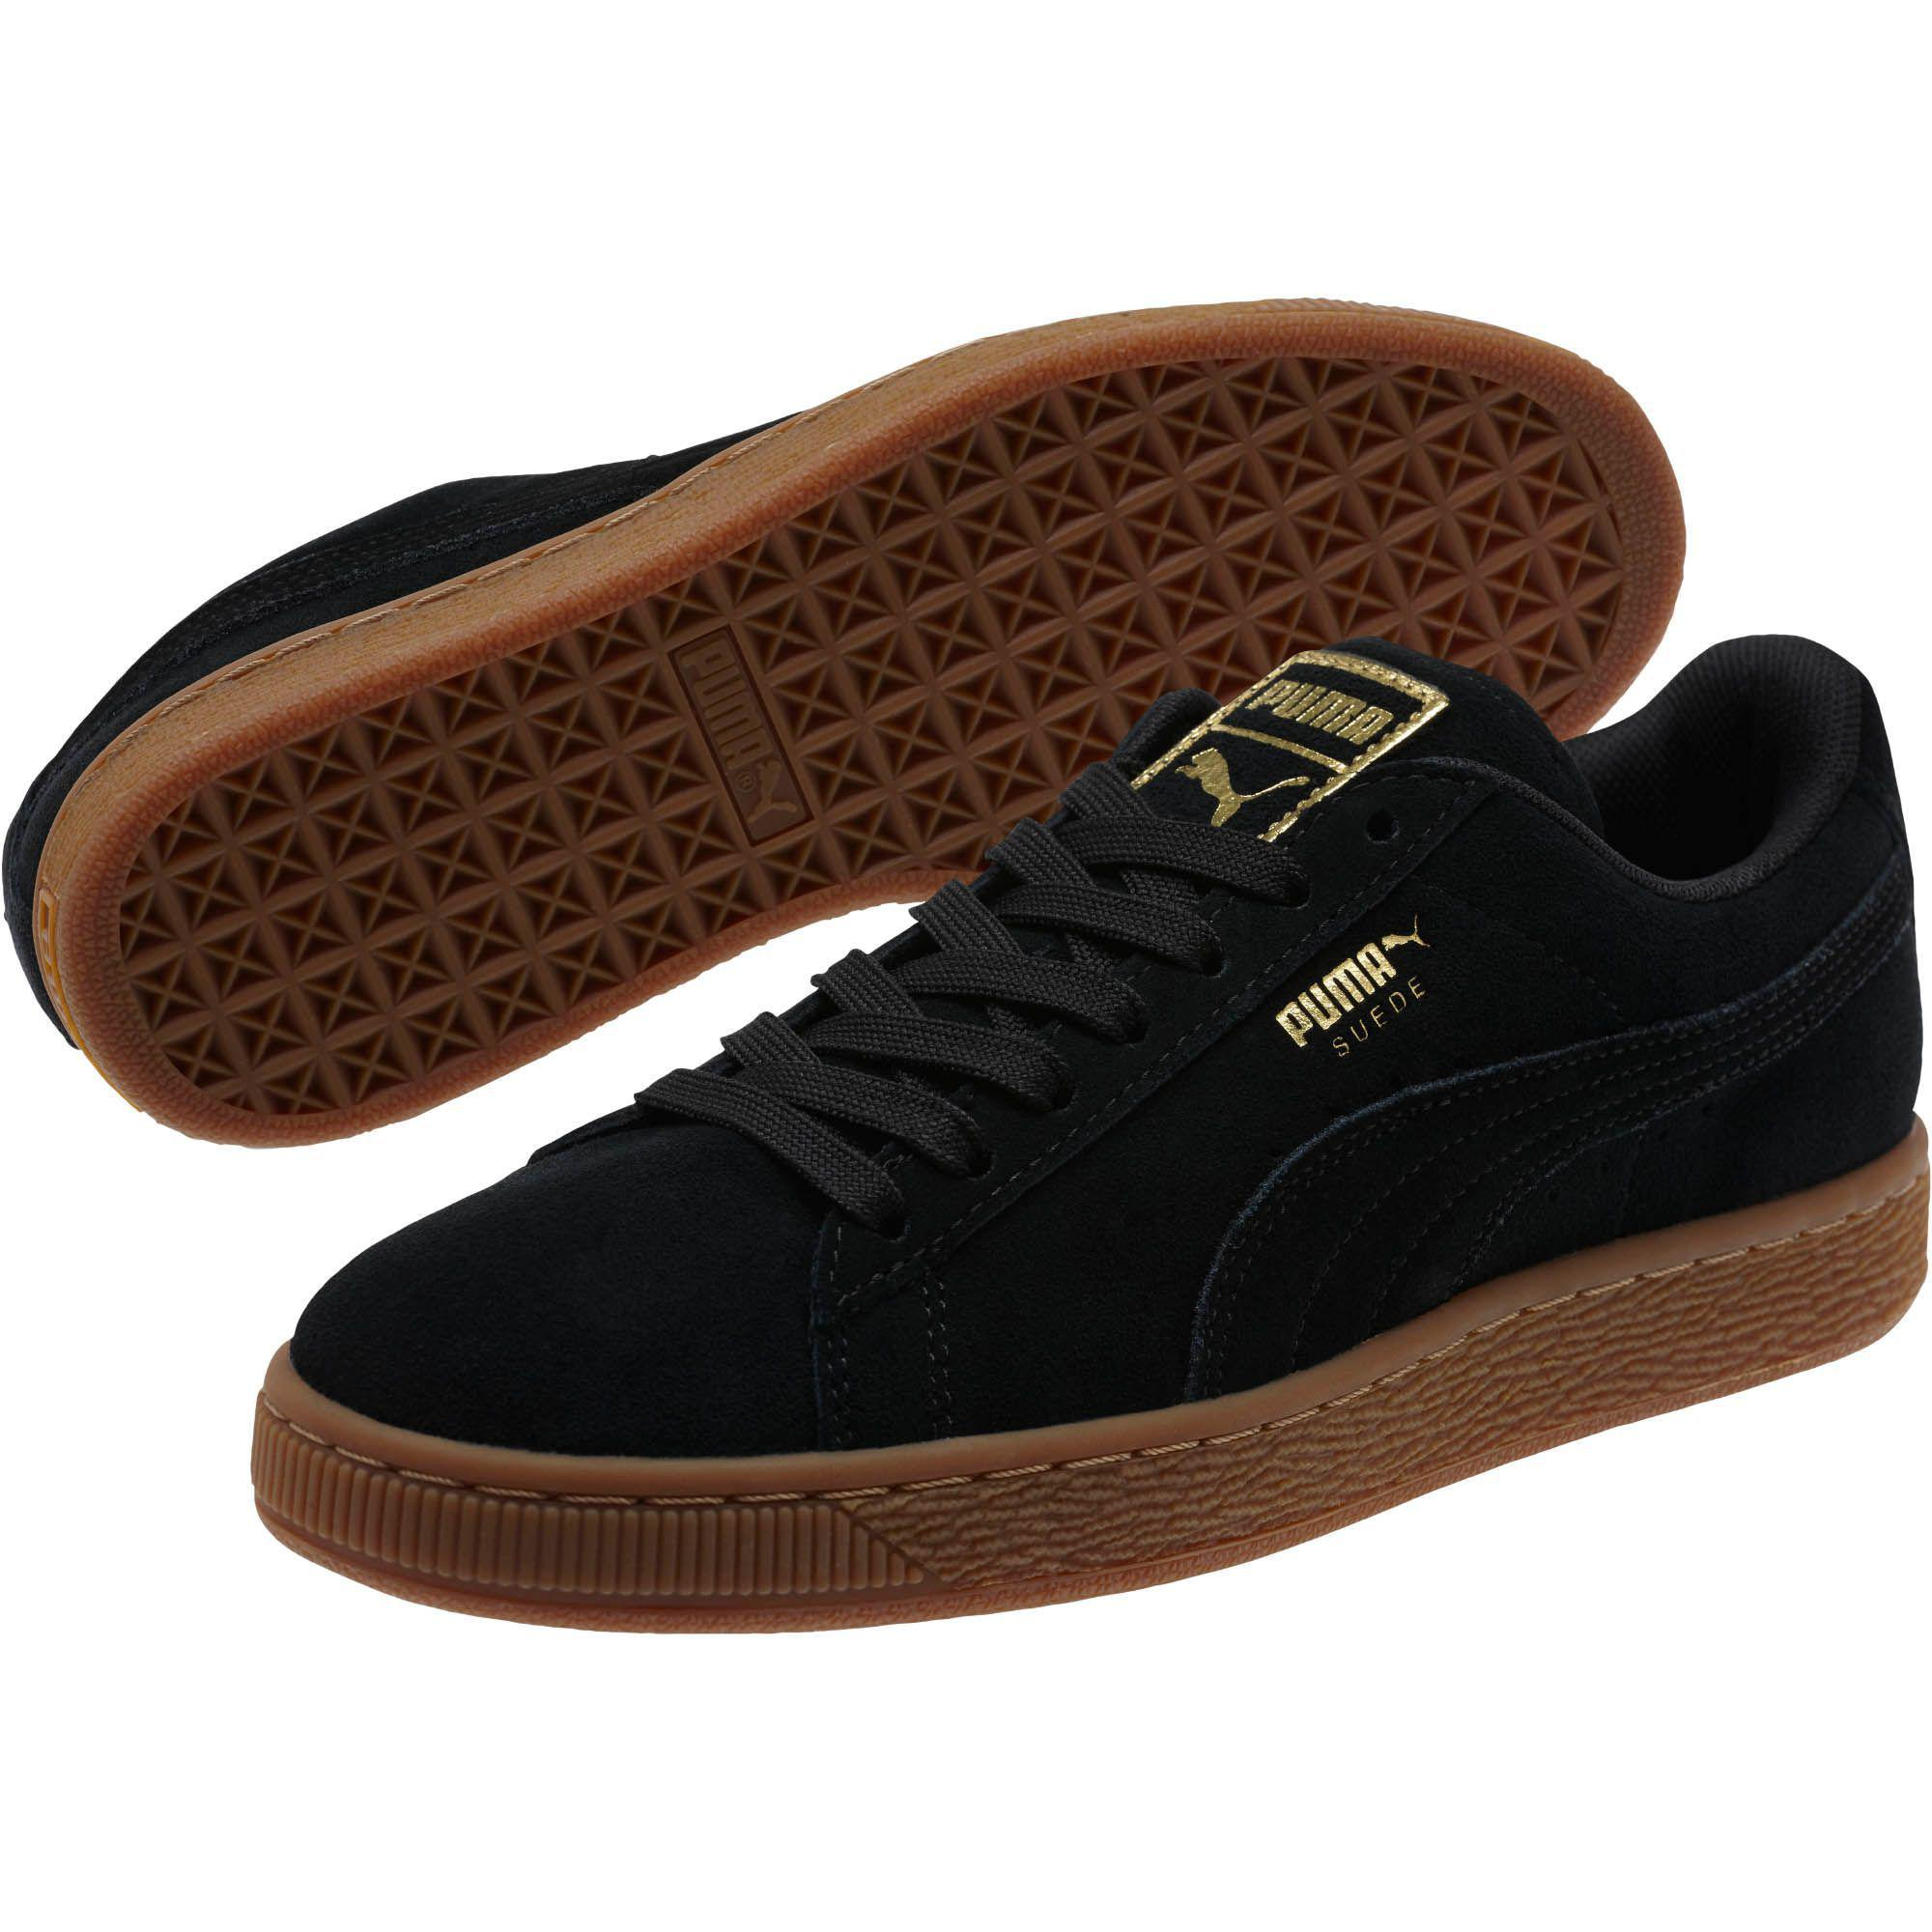 9a27fd95bb2 Lyst - PUMA Suede Classic Gold Women s Sneakers in Black